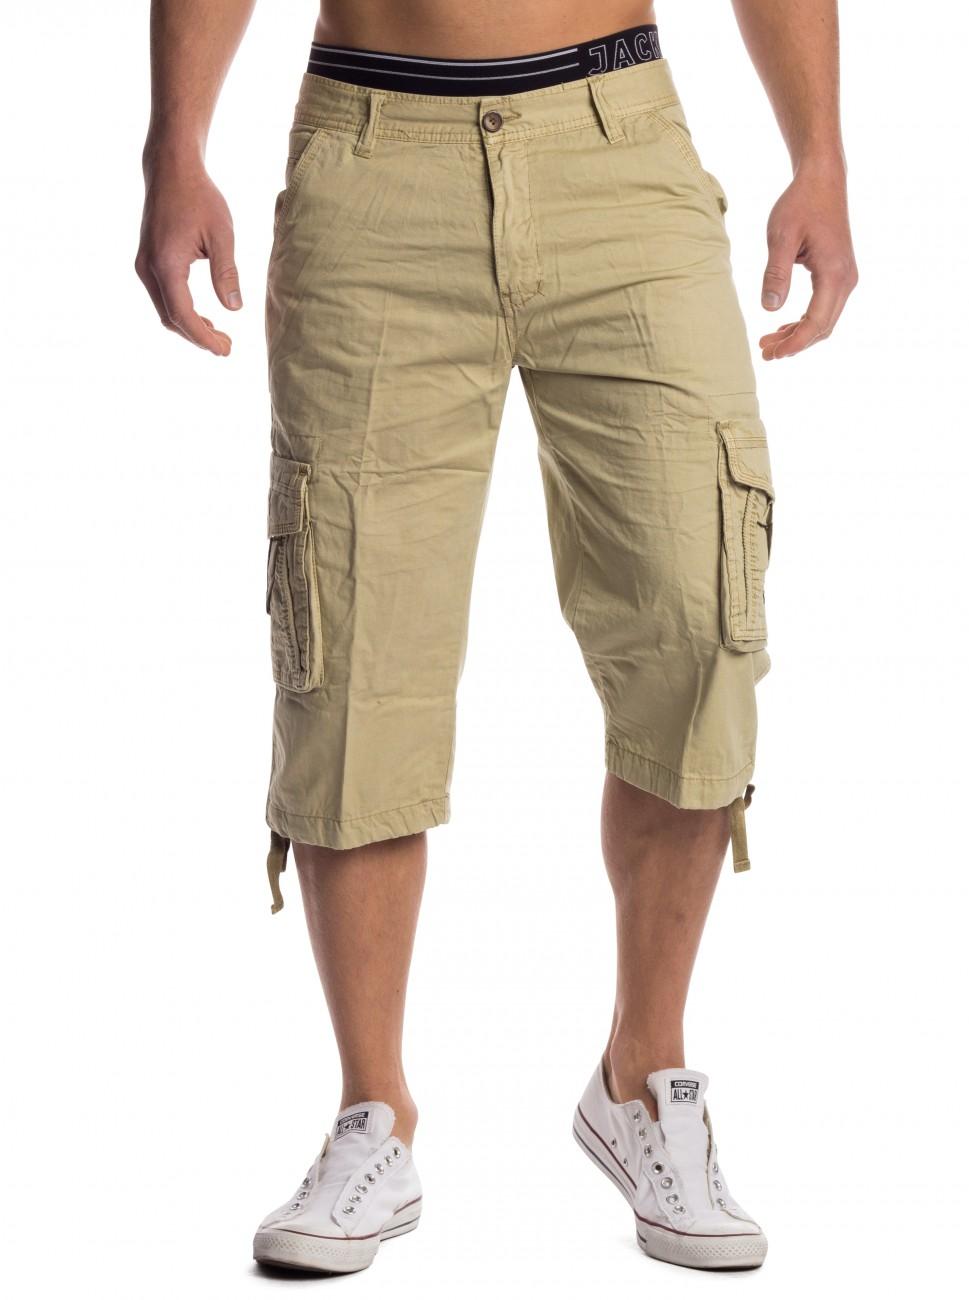 herren caprihose shorts 3 4 hose cargoshorts capri 100 baumwolle bermuda cargo ebay. Black Bedroom Furniture Sets. Home Design Ideas